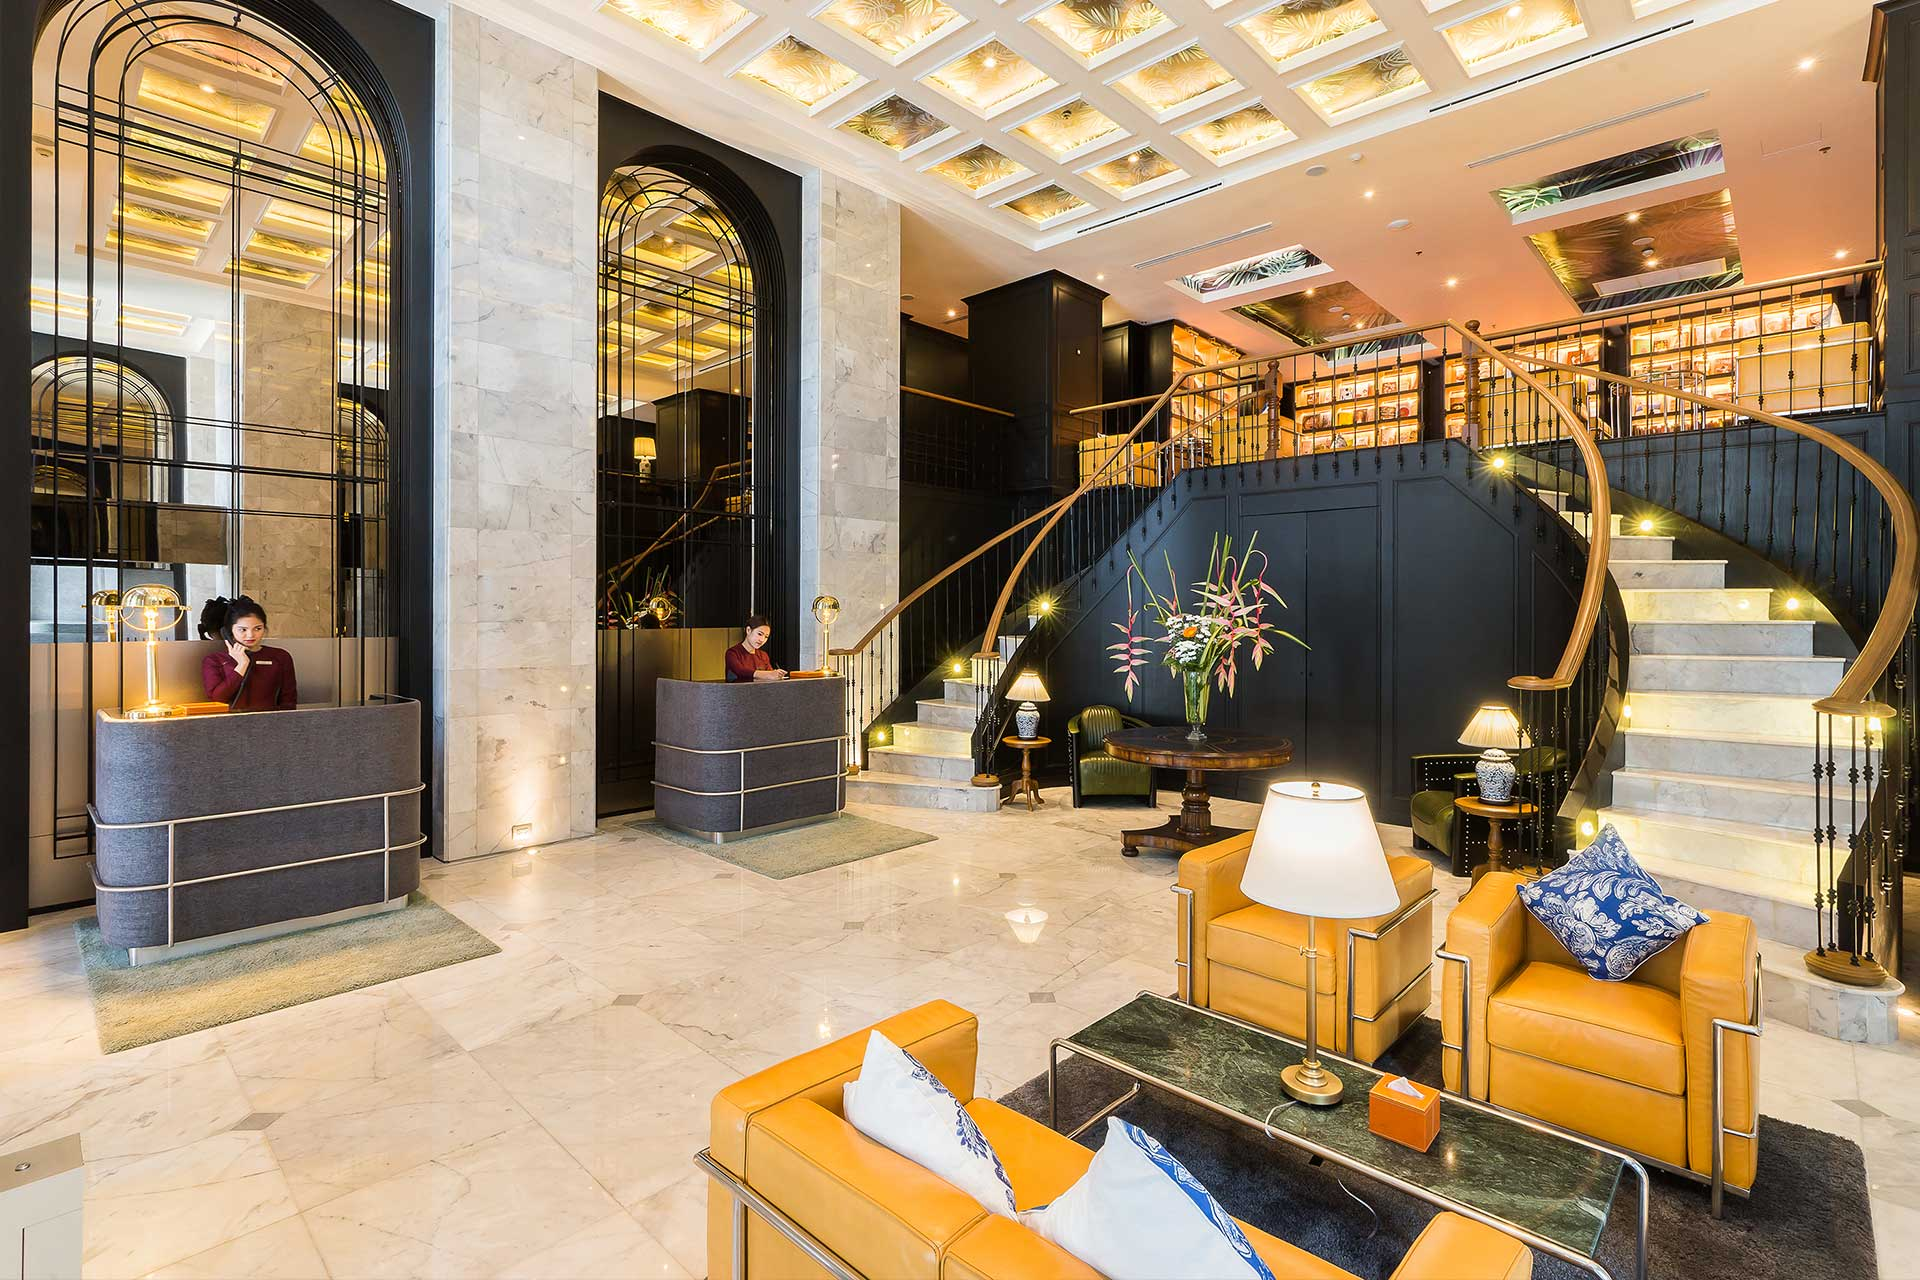 Akara Hotel Bangkok 5 Star Luxury Hotel In Bangkok An Essence Of